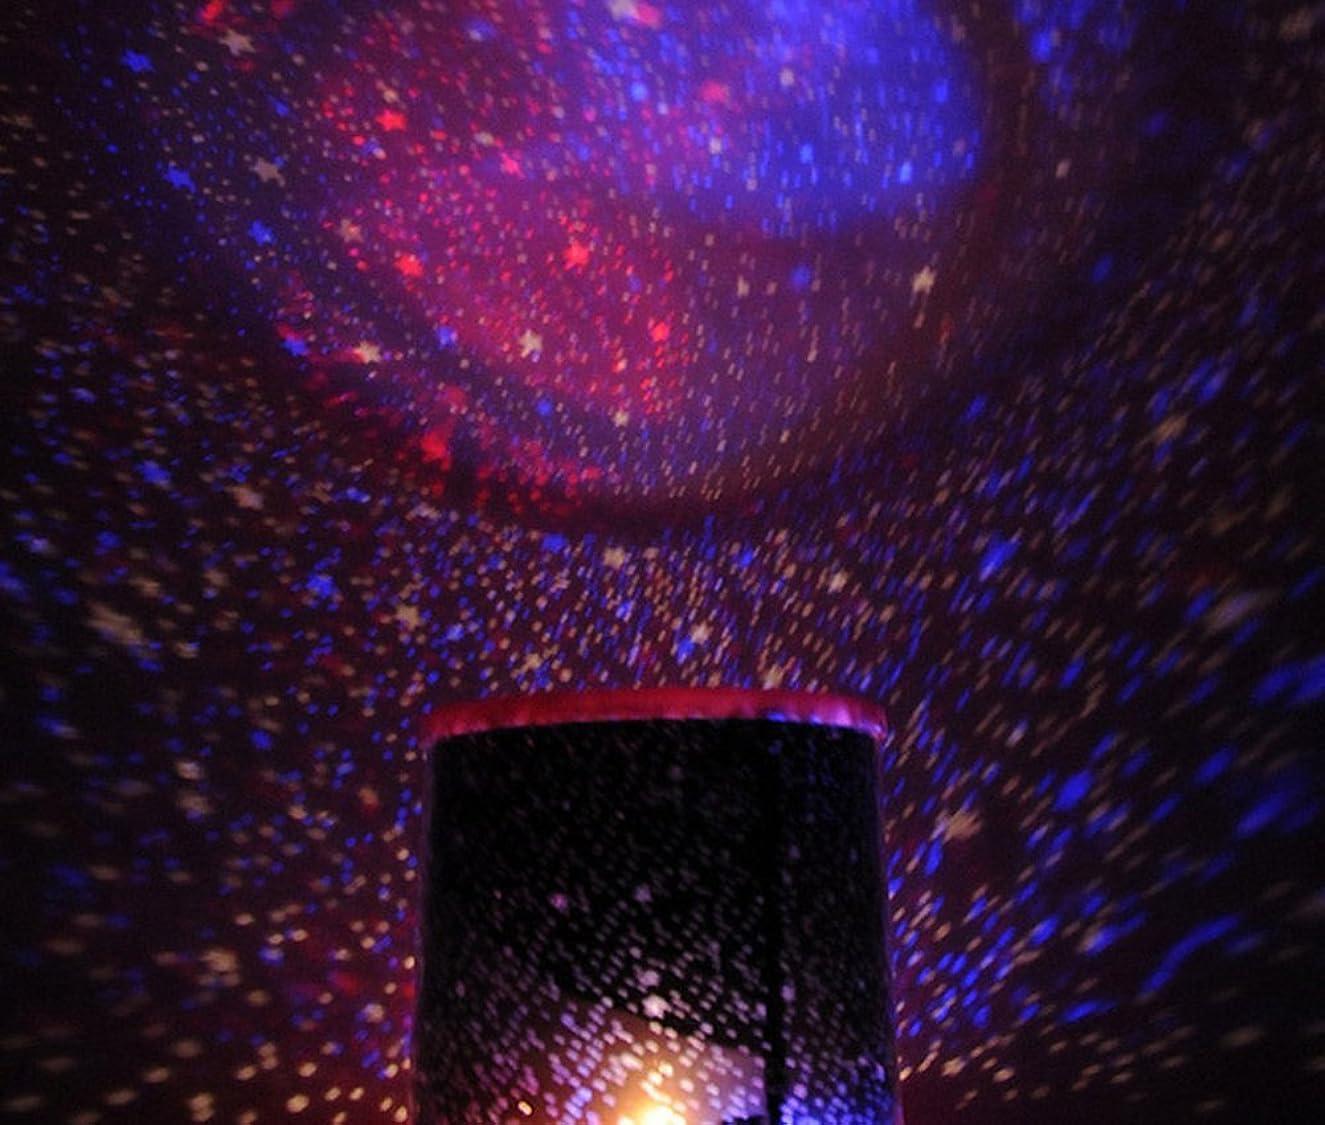 Rotating Music Astro Cosmos Star Starry Sky Projector Night Light Romantic LED Lamp